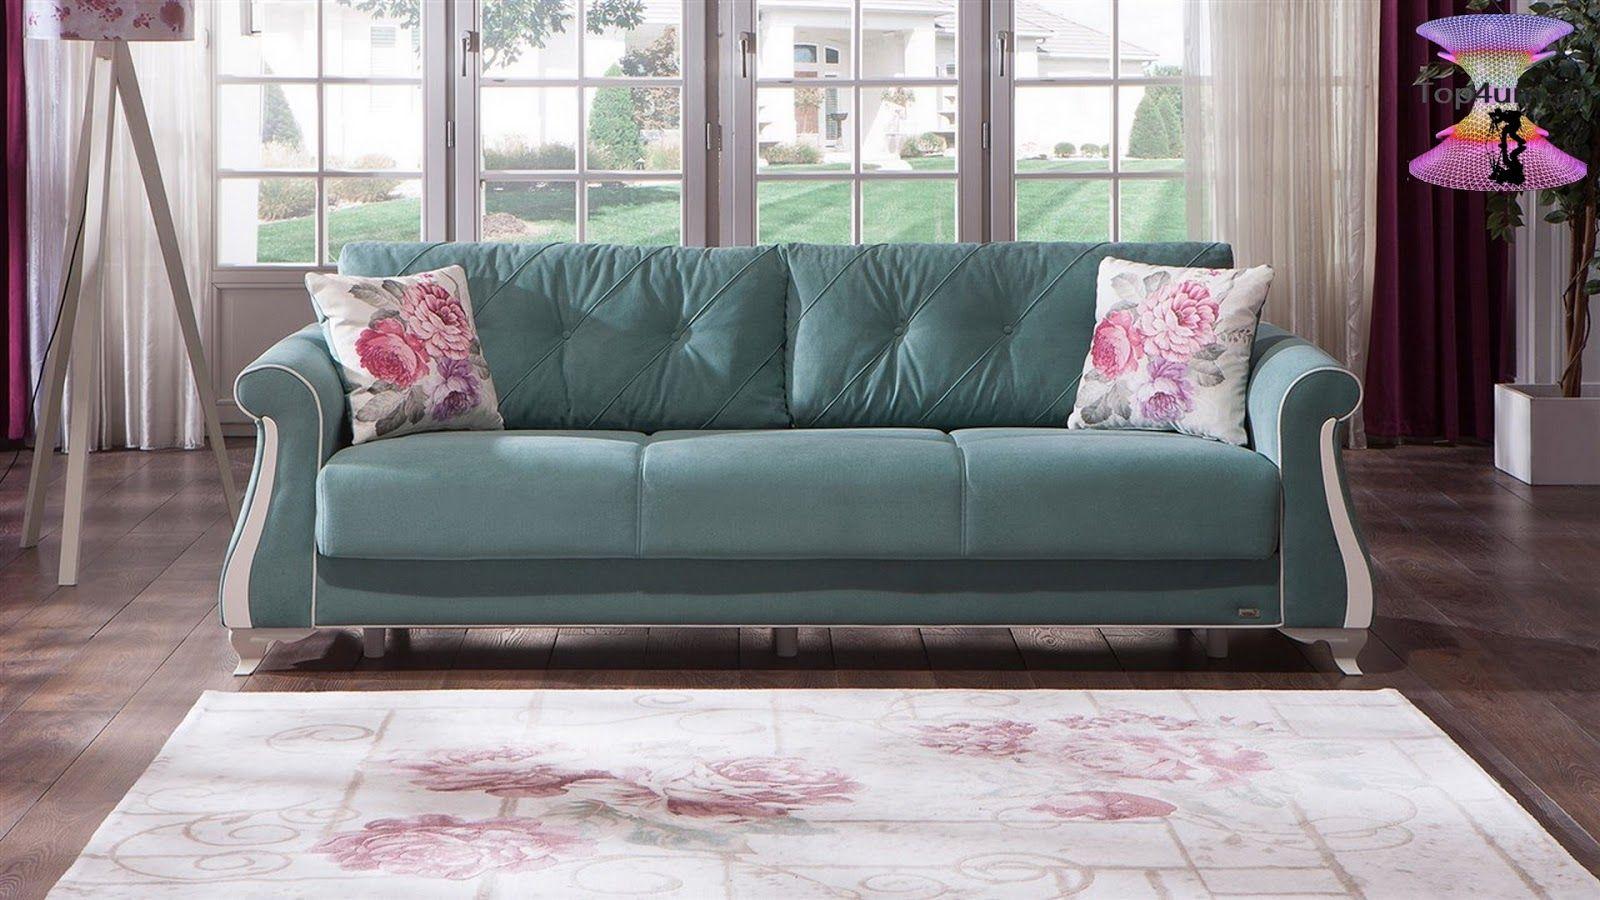 اشكال انتريهات مودرن من أحدث موديلات الأنتريهات 2019 Modern Furniture Designs Sofa Design Wood Furniture Design Modern Sofa Design